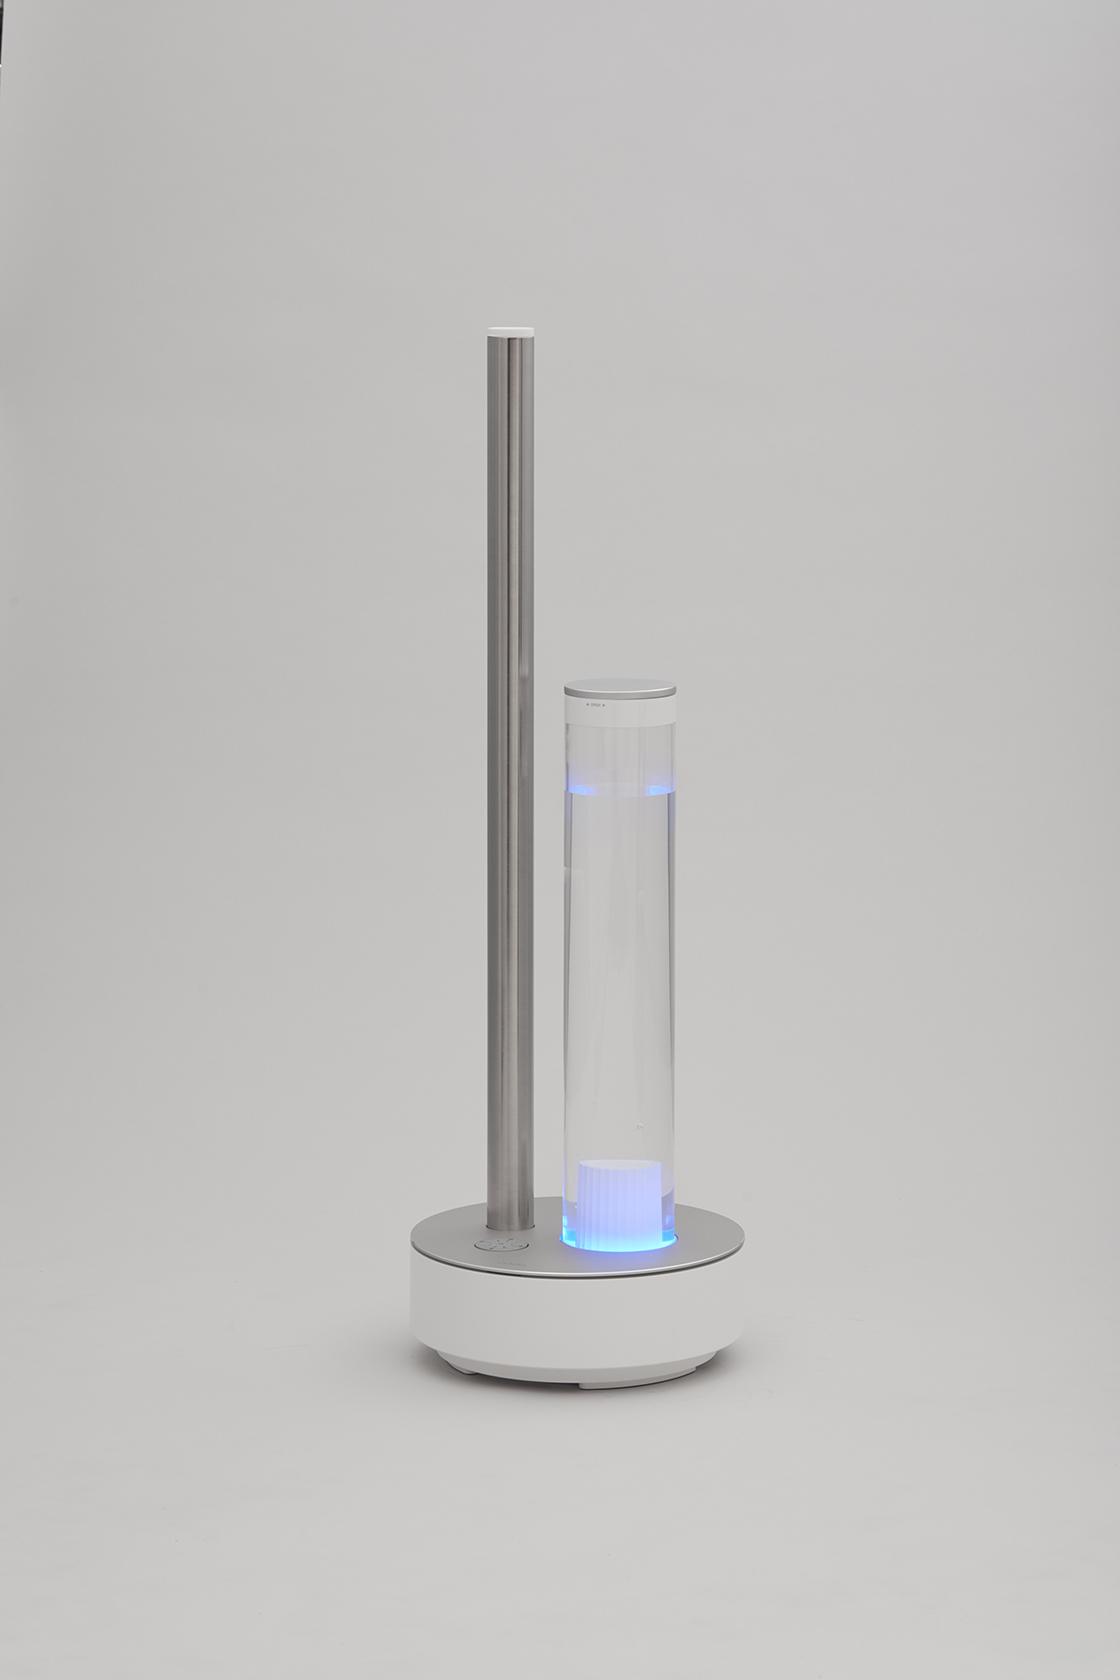 RoomClip商品情報 - cado カドー 超音波式加湿器 STEM 620 HM-C620